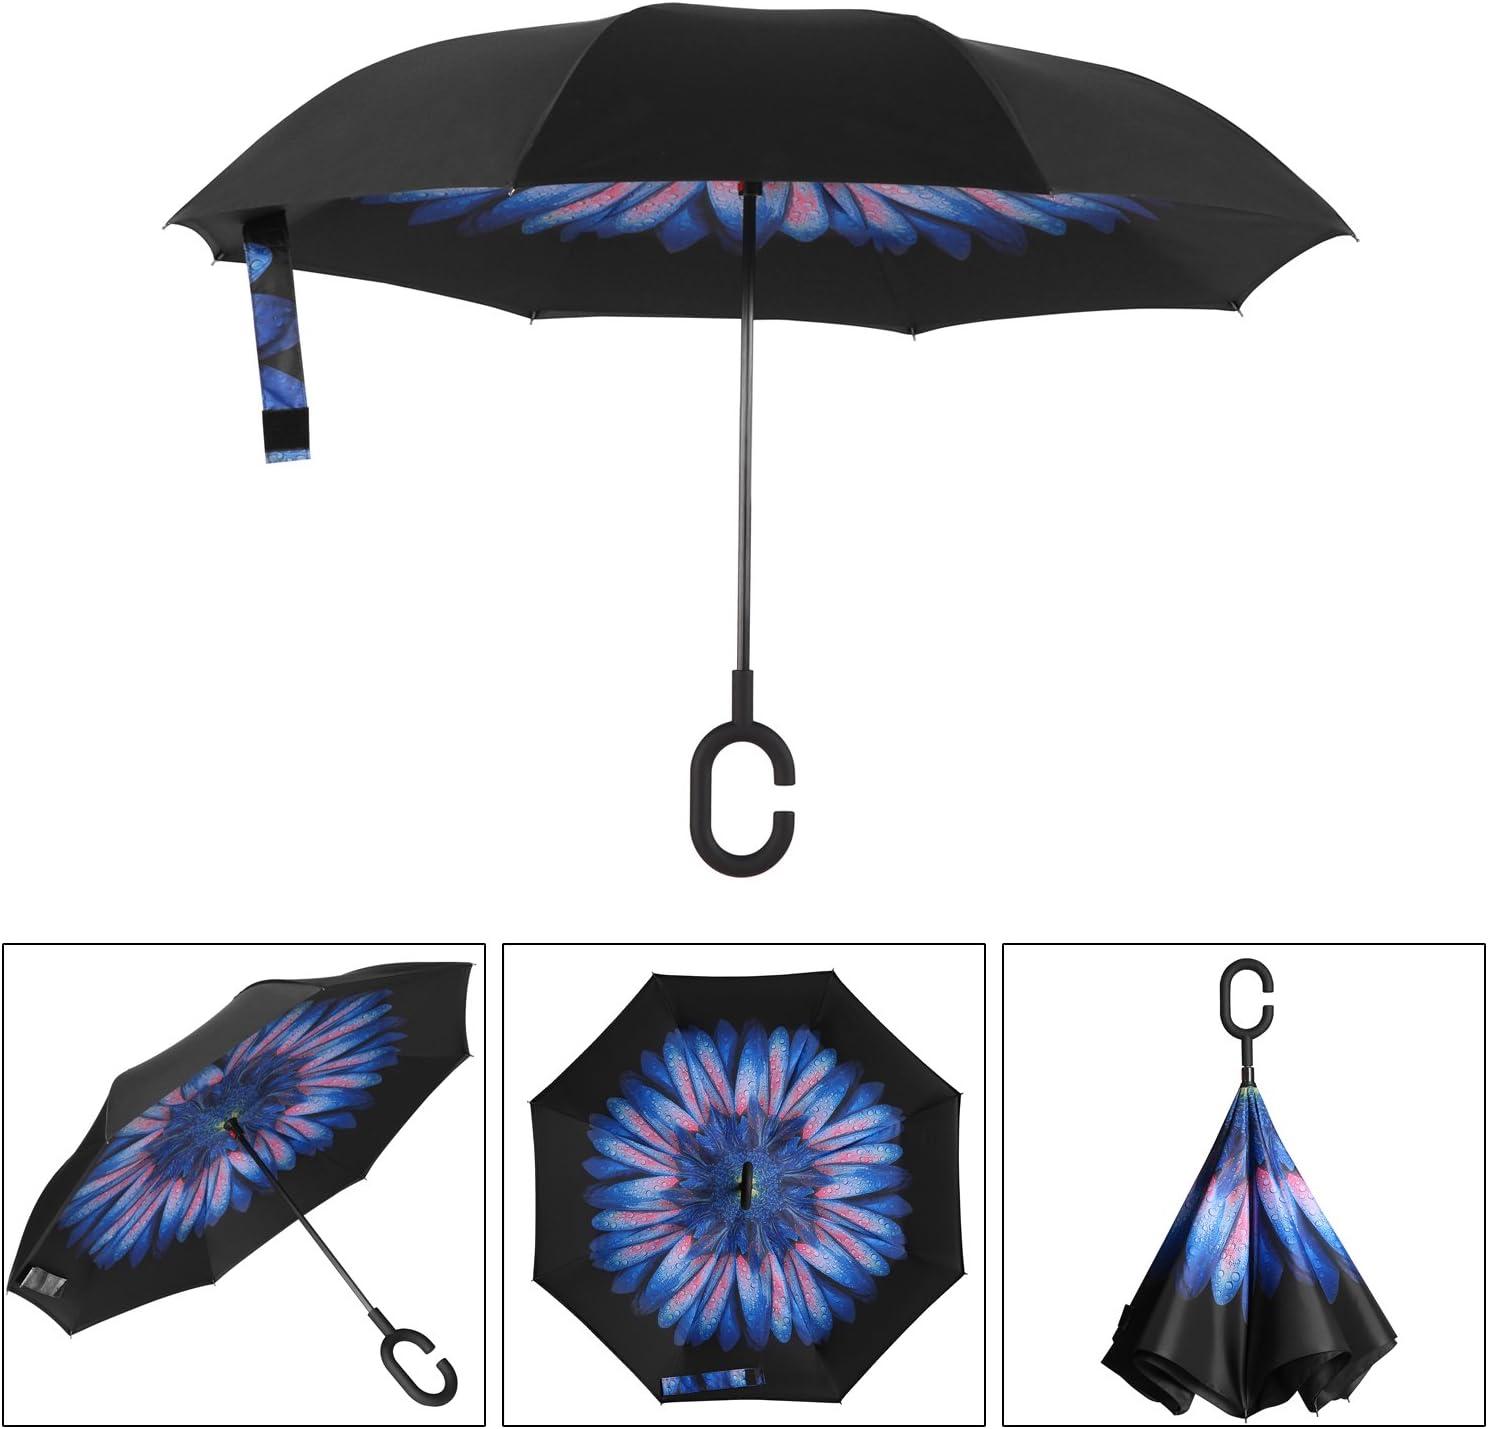 Cartoon Naruto Car Reverse Umbrella Windproof And Rainproof Double Folding Inverted Umbrella With C-Shaped Handle UV Protection Inverted Folding Umbrellas